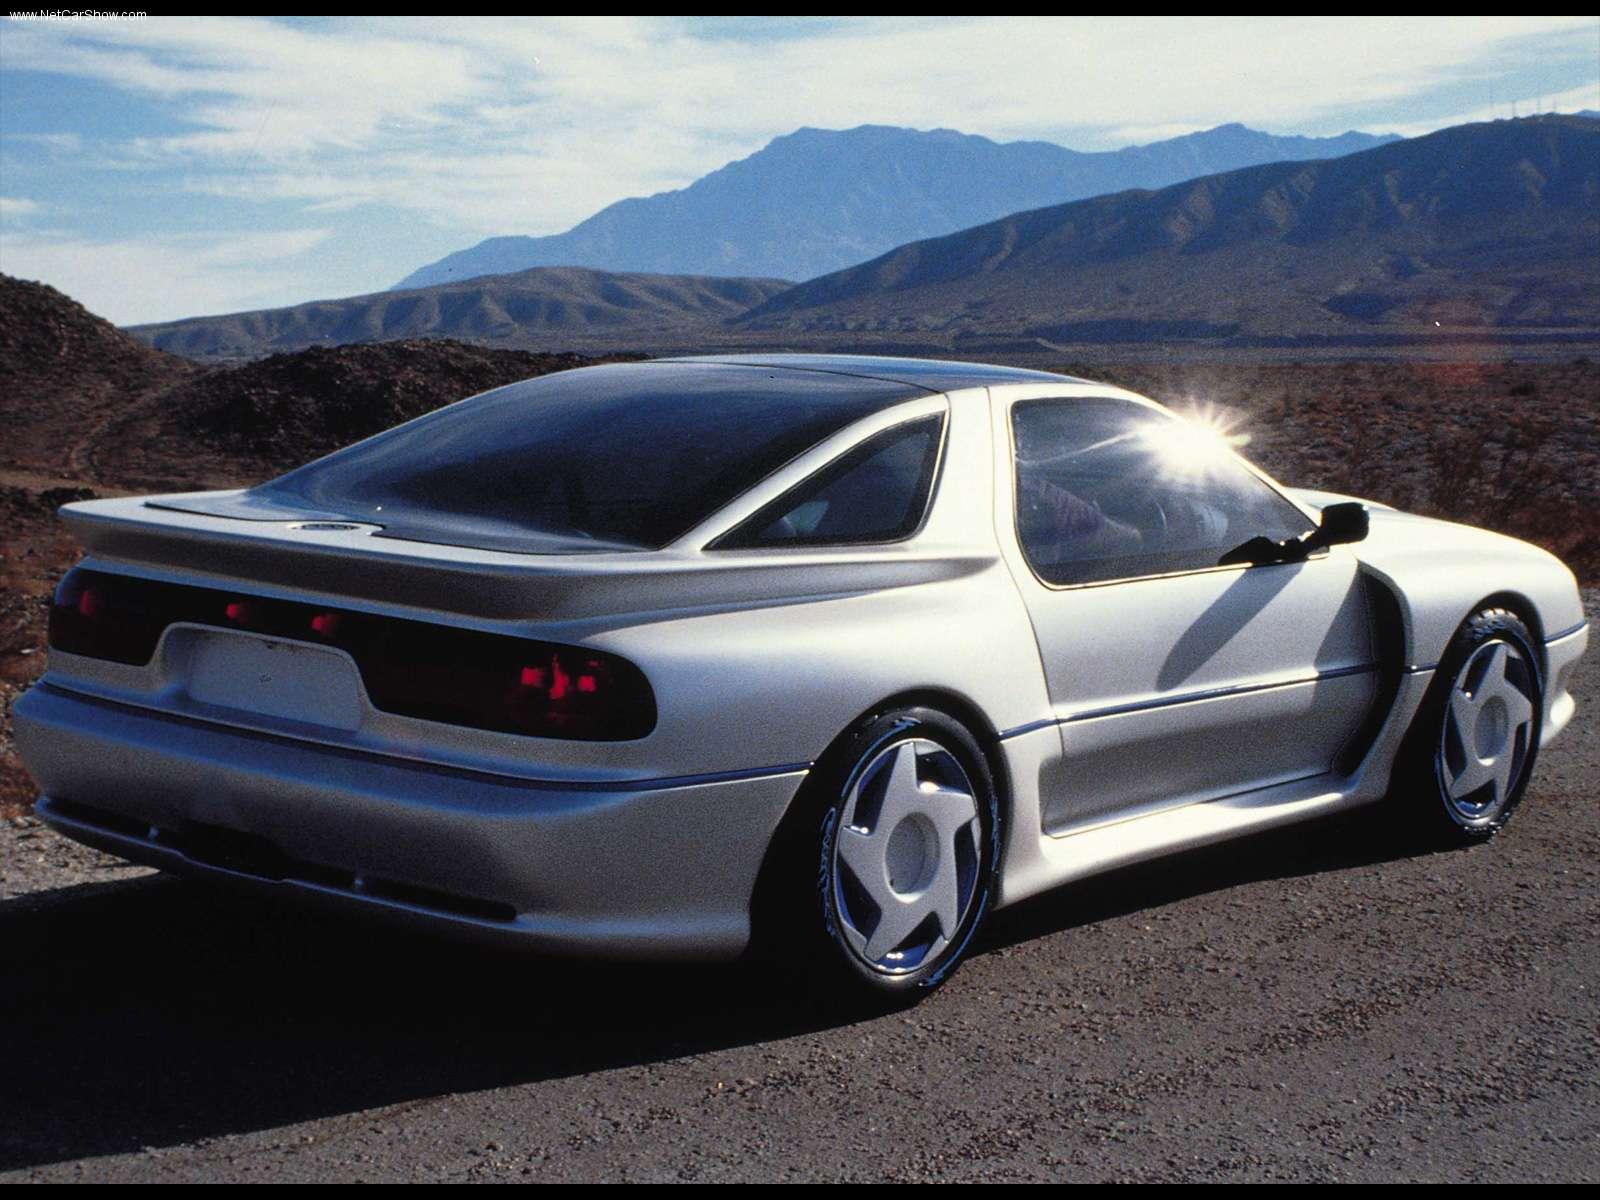 Dodge Daytona Rt Concept X Wallpaper